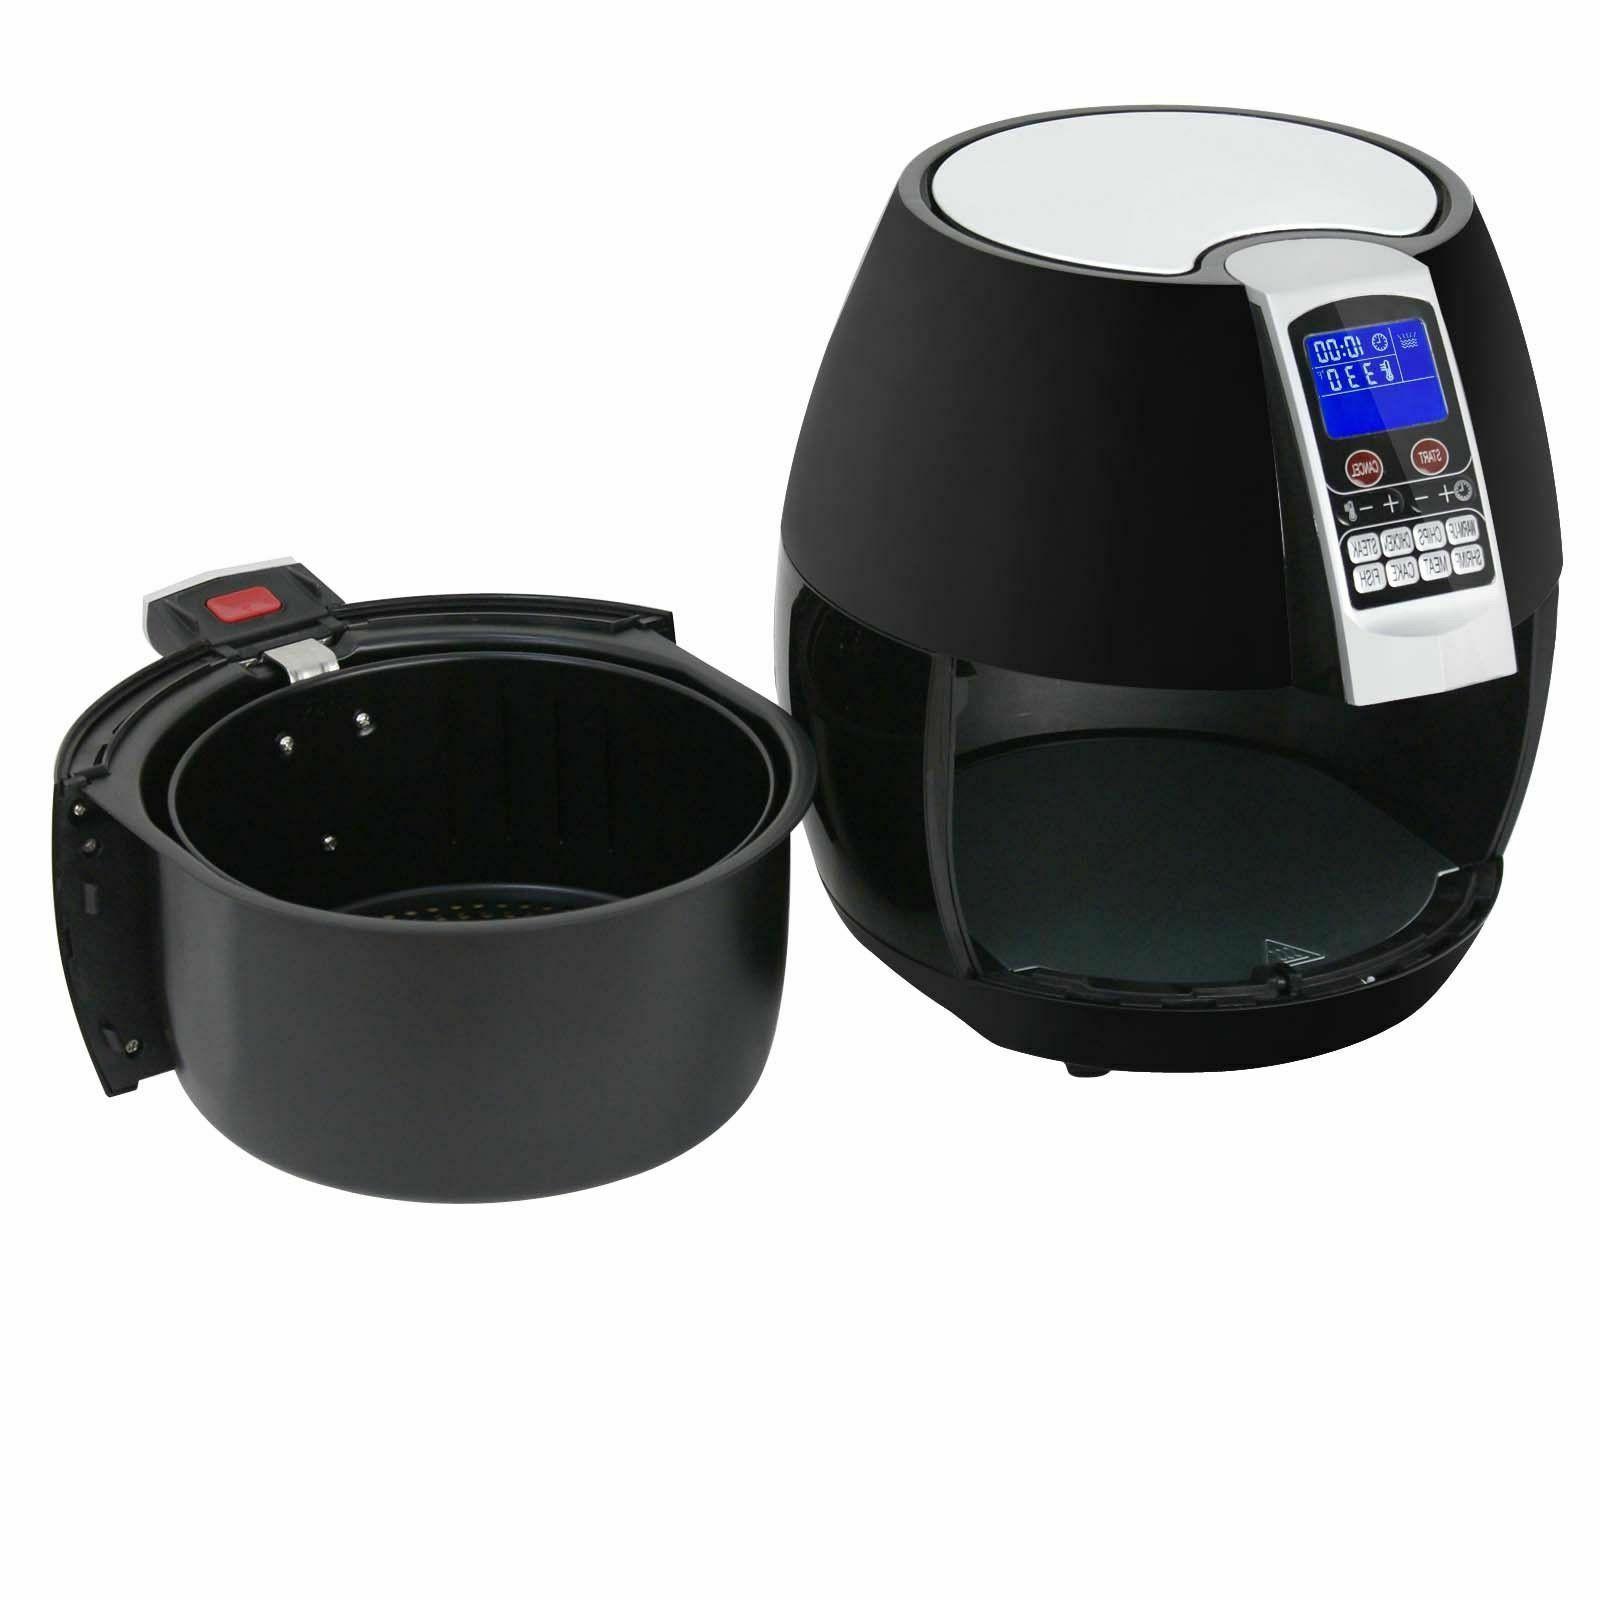 1500W LCD Fryer W/ 8 Presets, Control, Timer